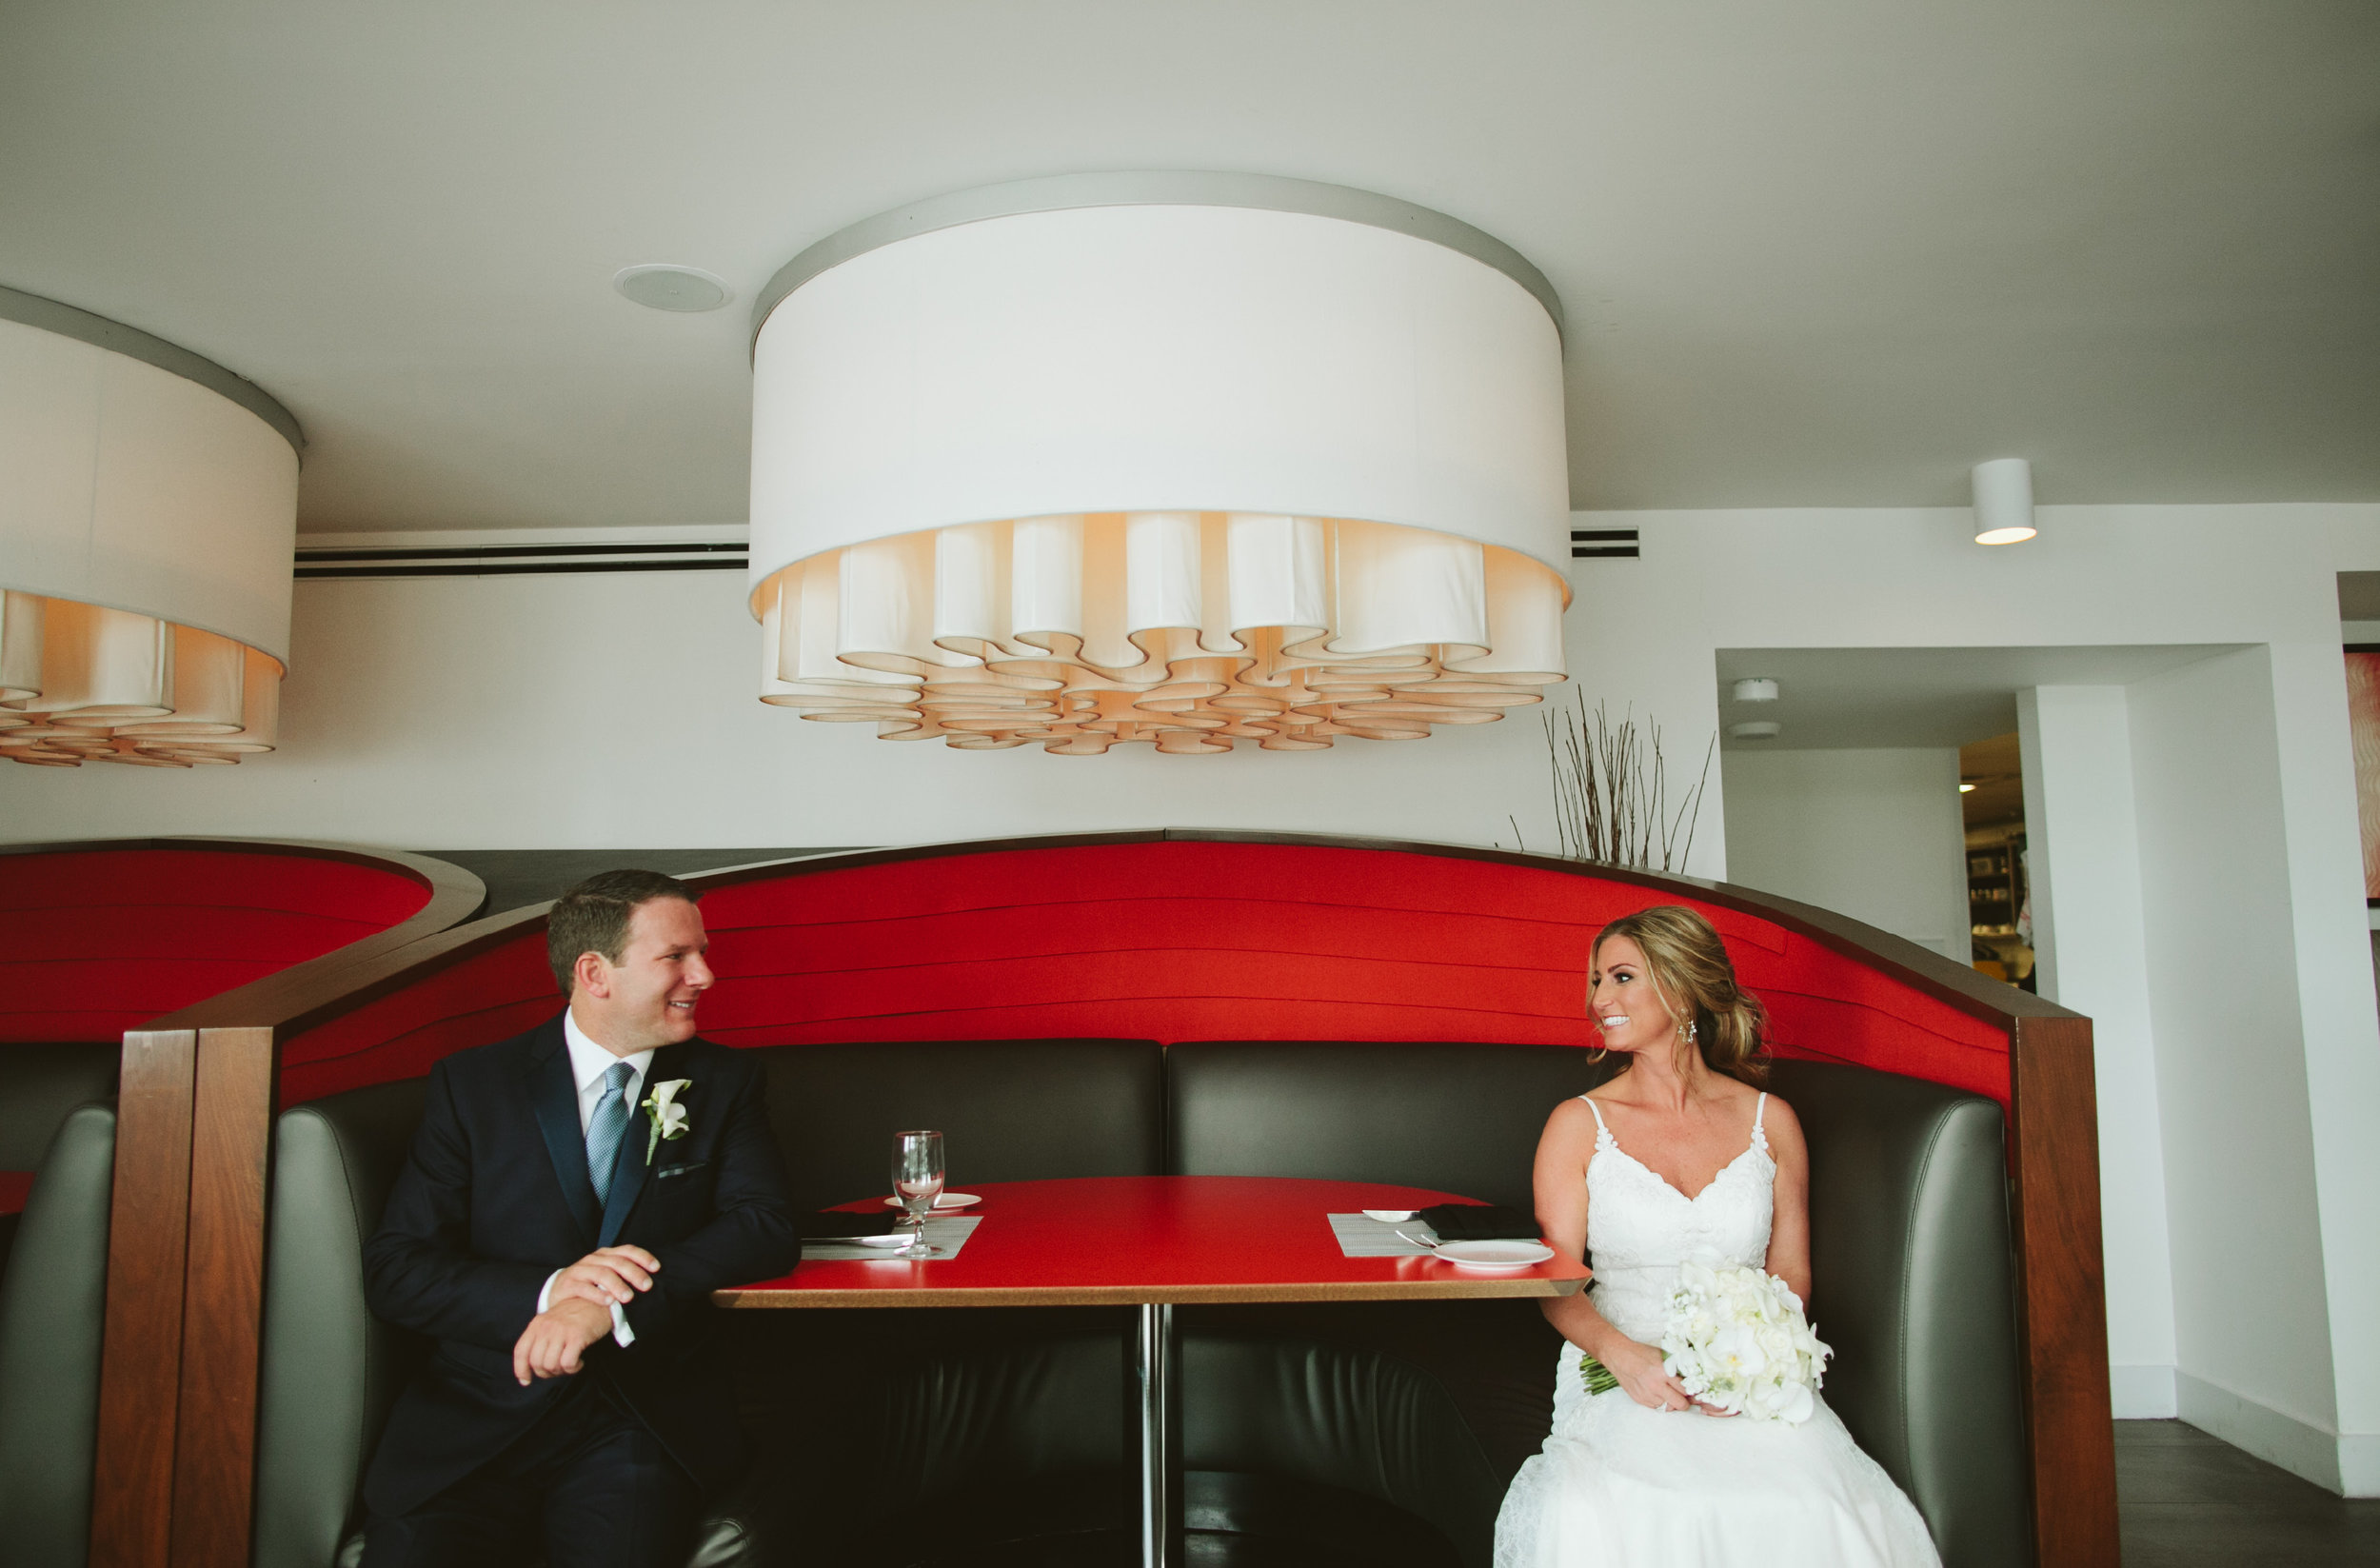 Kim + John's Wedding at the Waterstone Hotel in Boca Raton35.jpg